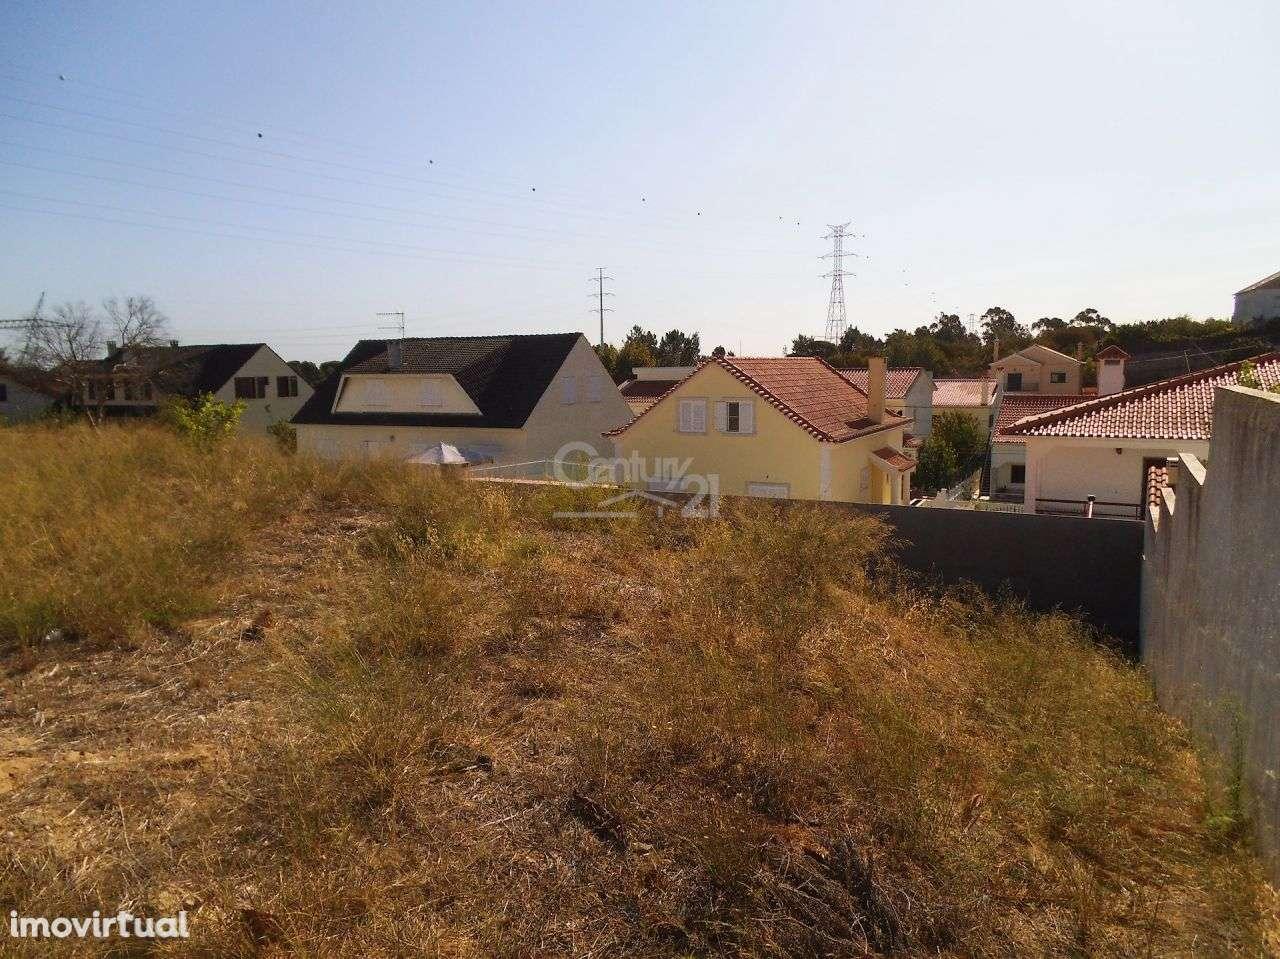 Terreno para comprar, Charneca de Caparica e Sobreda, Almada, Setúbal - Foto 6